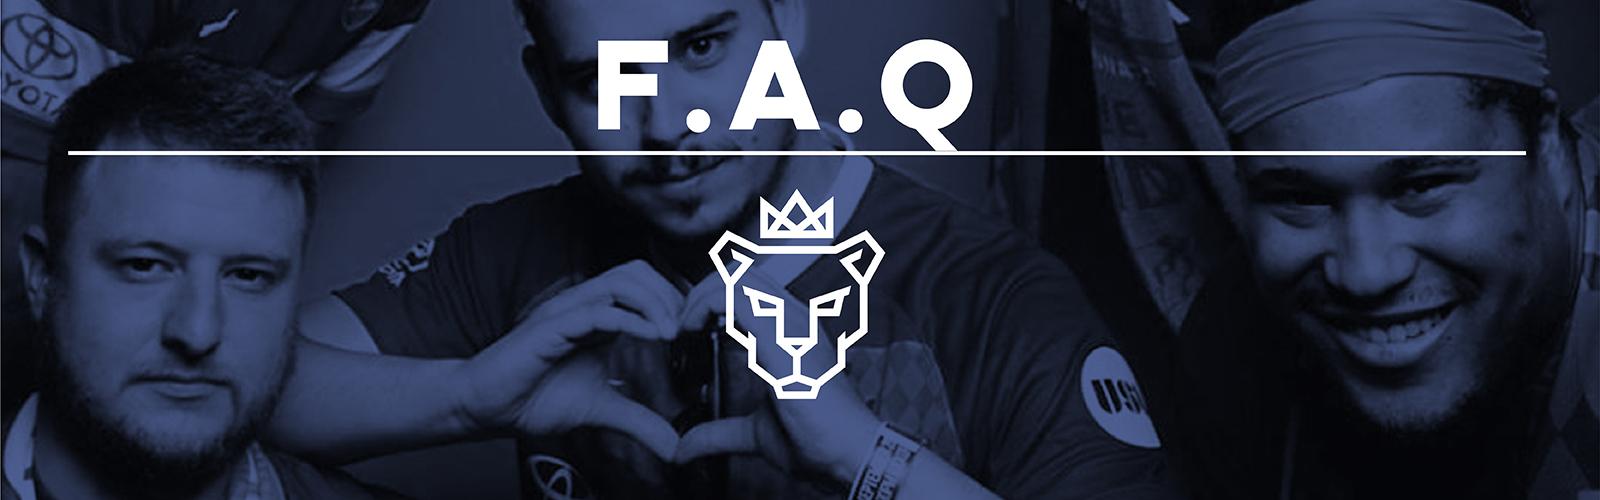 FAQ Banner.jpg